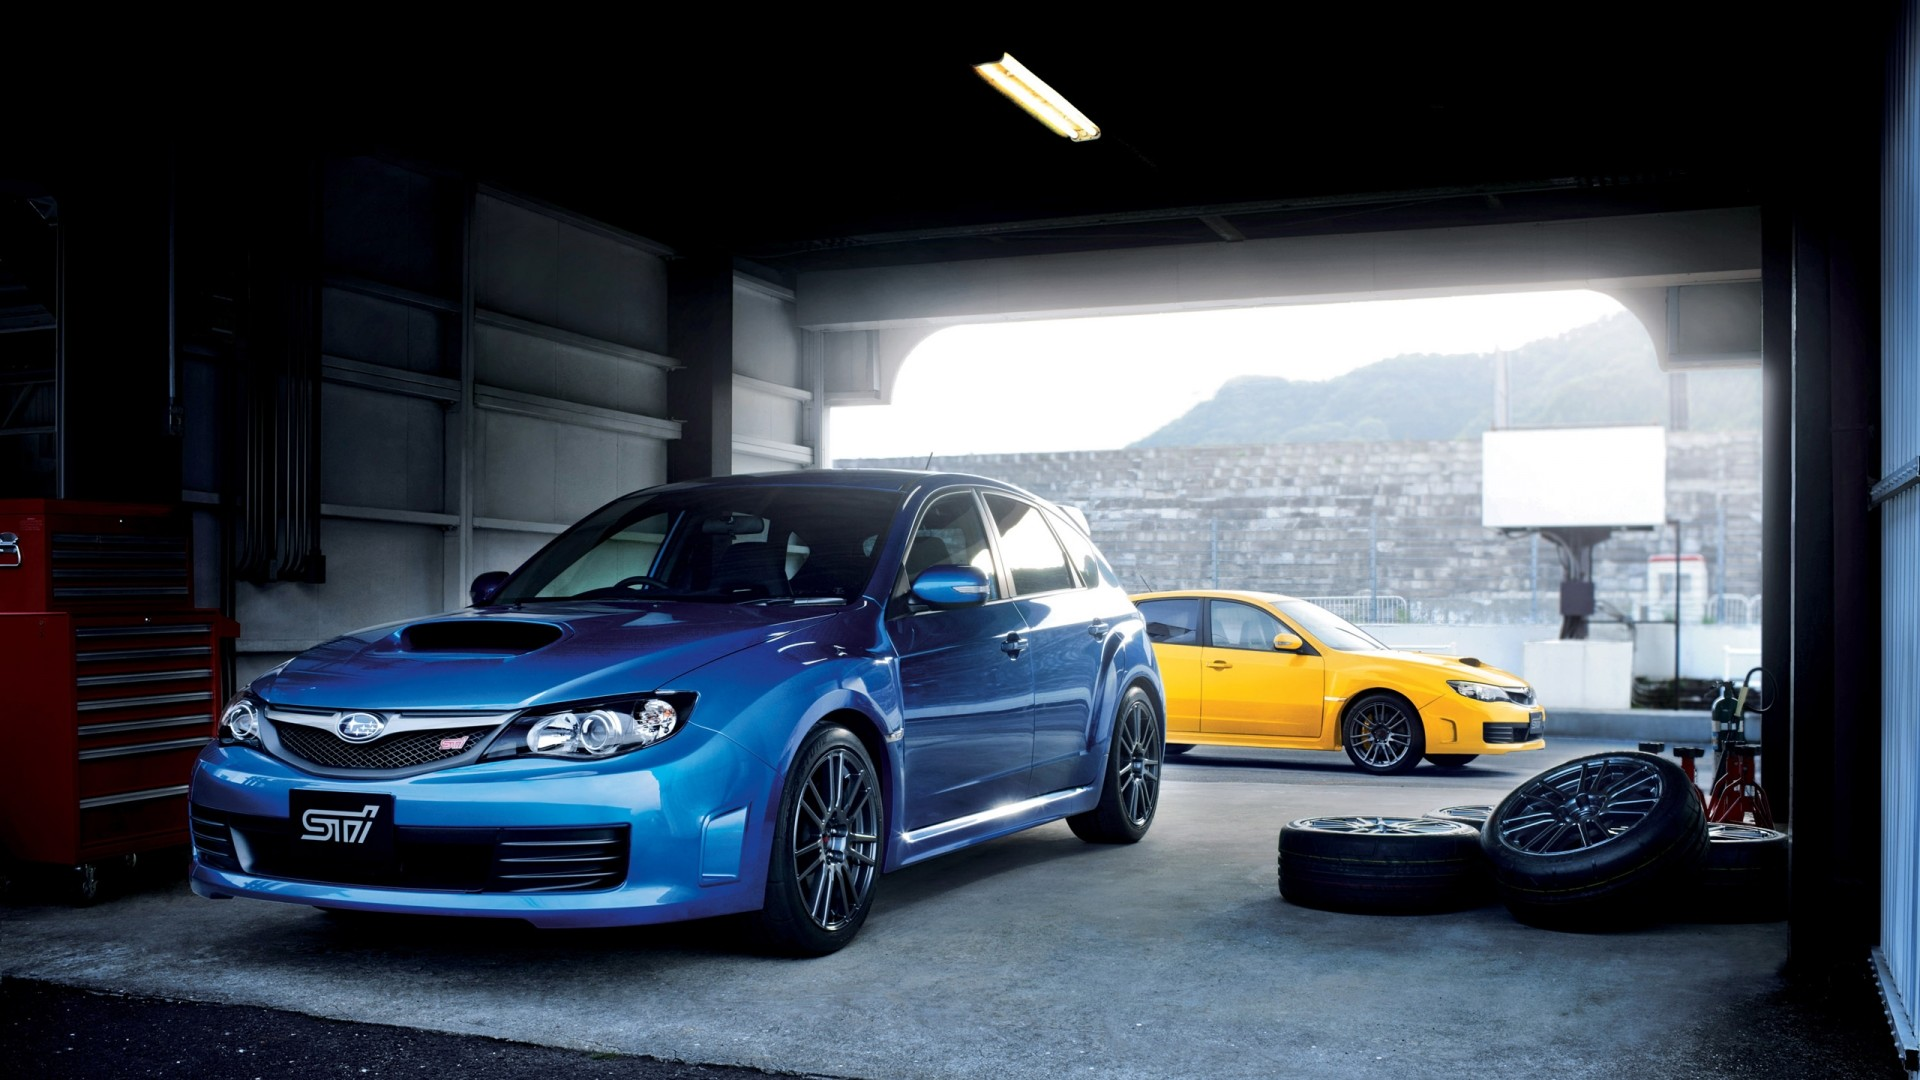 Subaru Wrx Sti Wallpaper Hd – https://hdwallpaper.info/subaru-wrx-sti- wallpaper-hd/ HD Wallpapers | HD Wallpapers | Pinterest | Subaru, Wallpaper  and …